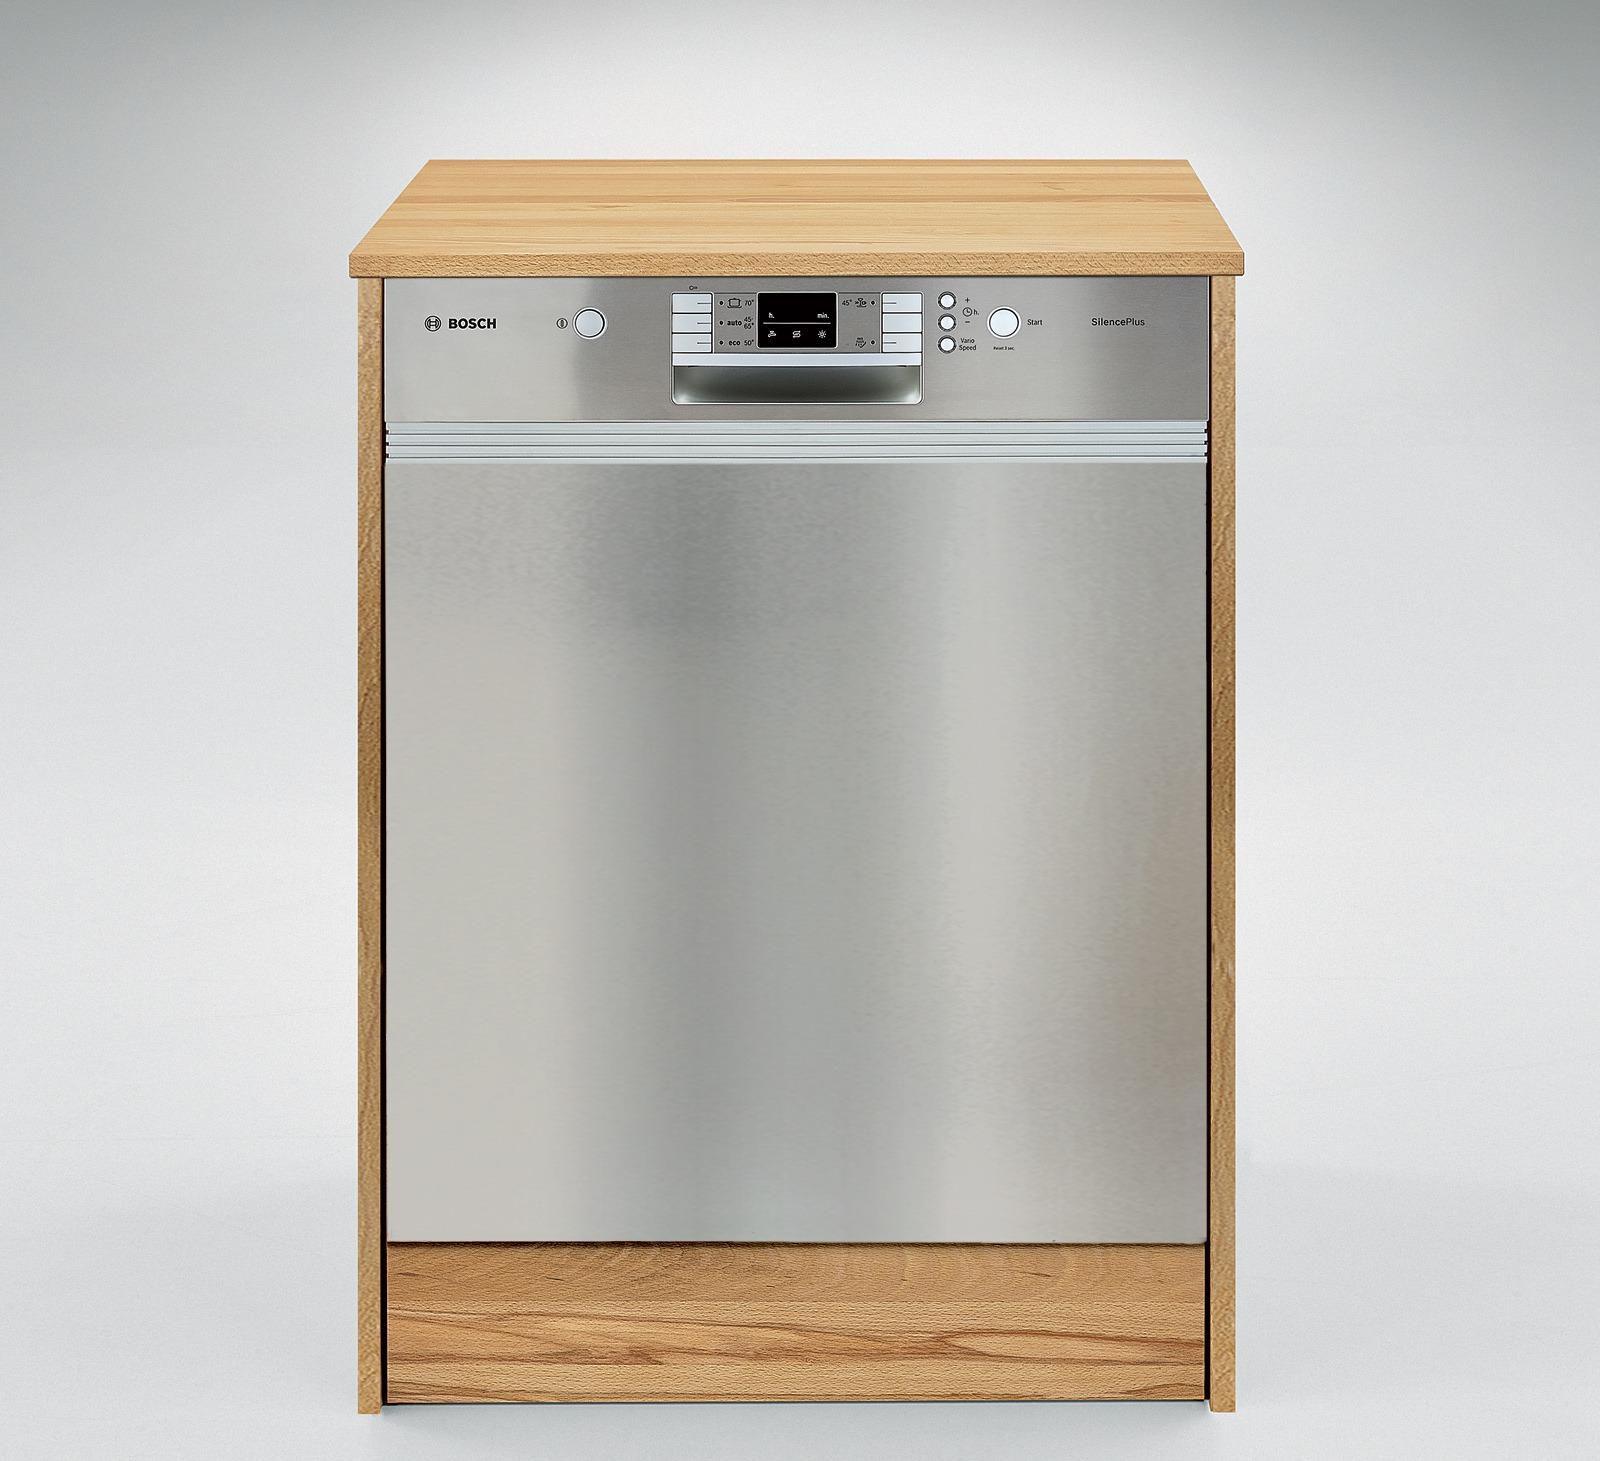 Geschirrspuler Einbauschrank Culinara 100 Massivholz